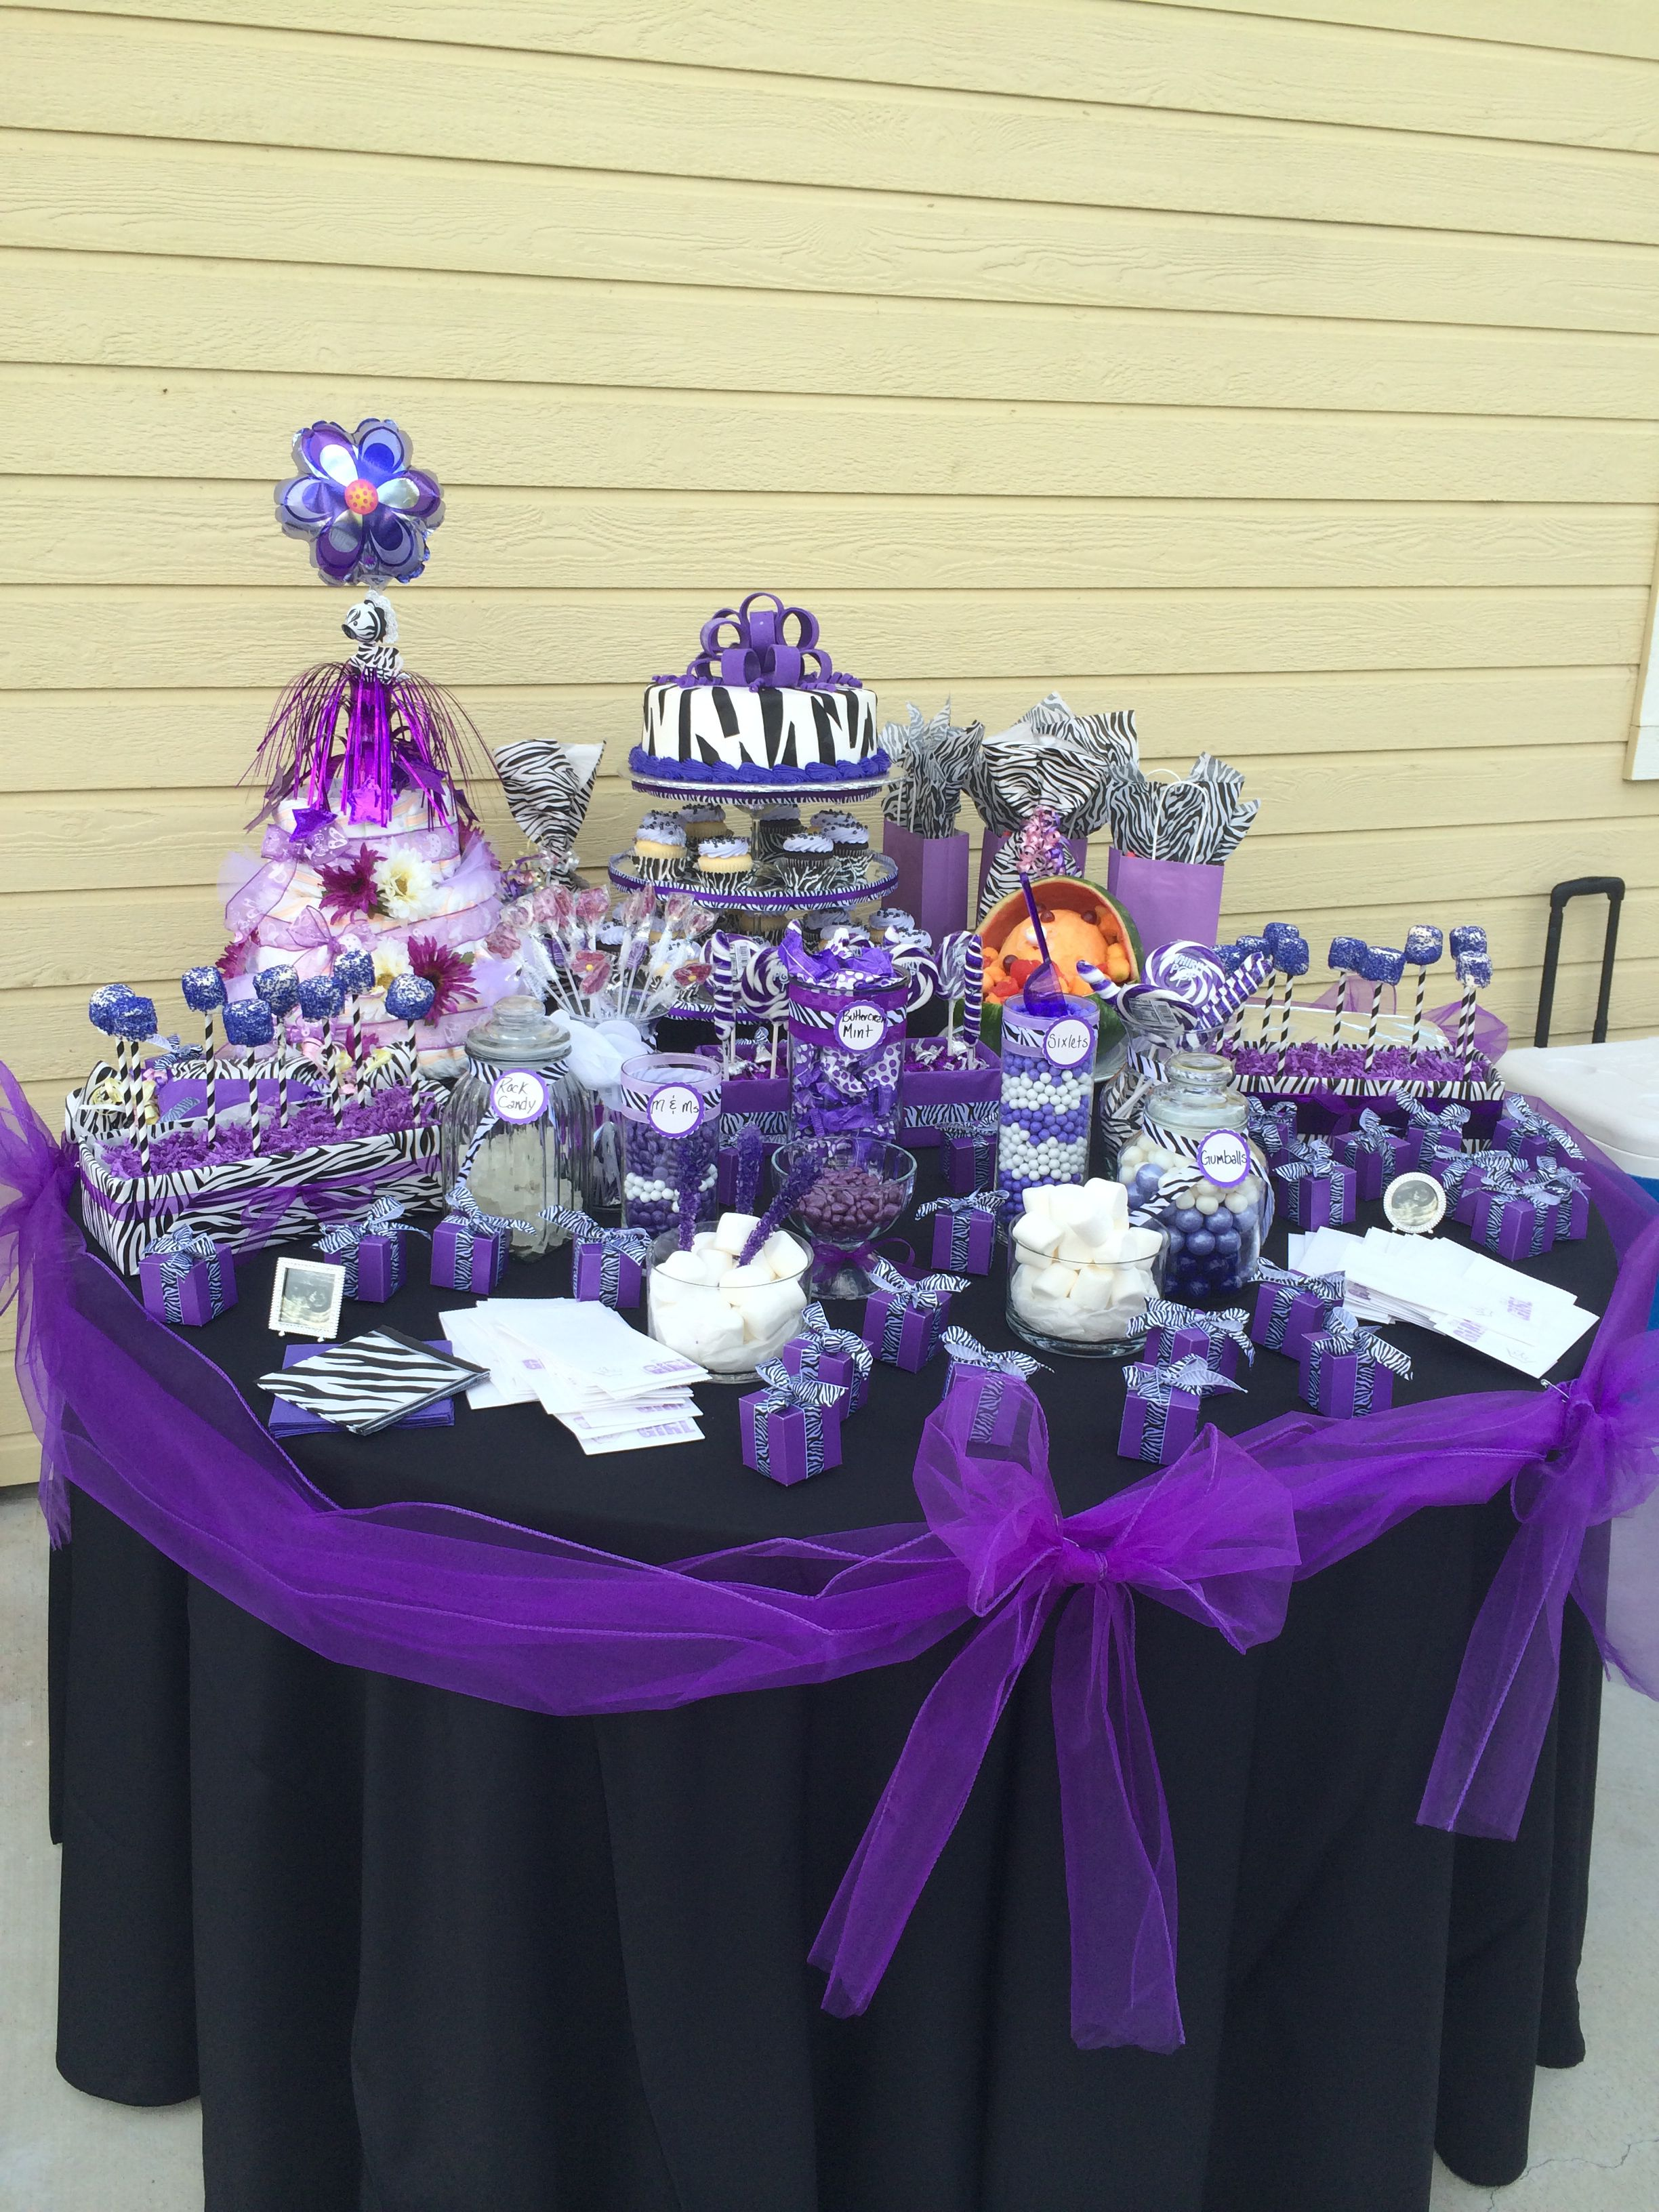 Purple Zebra Baby Shower Decorations  from i.pinimg.com